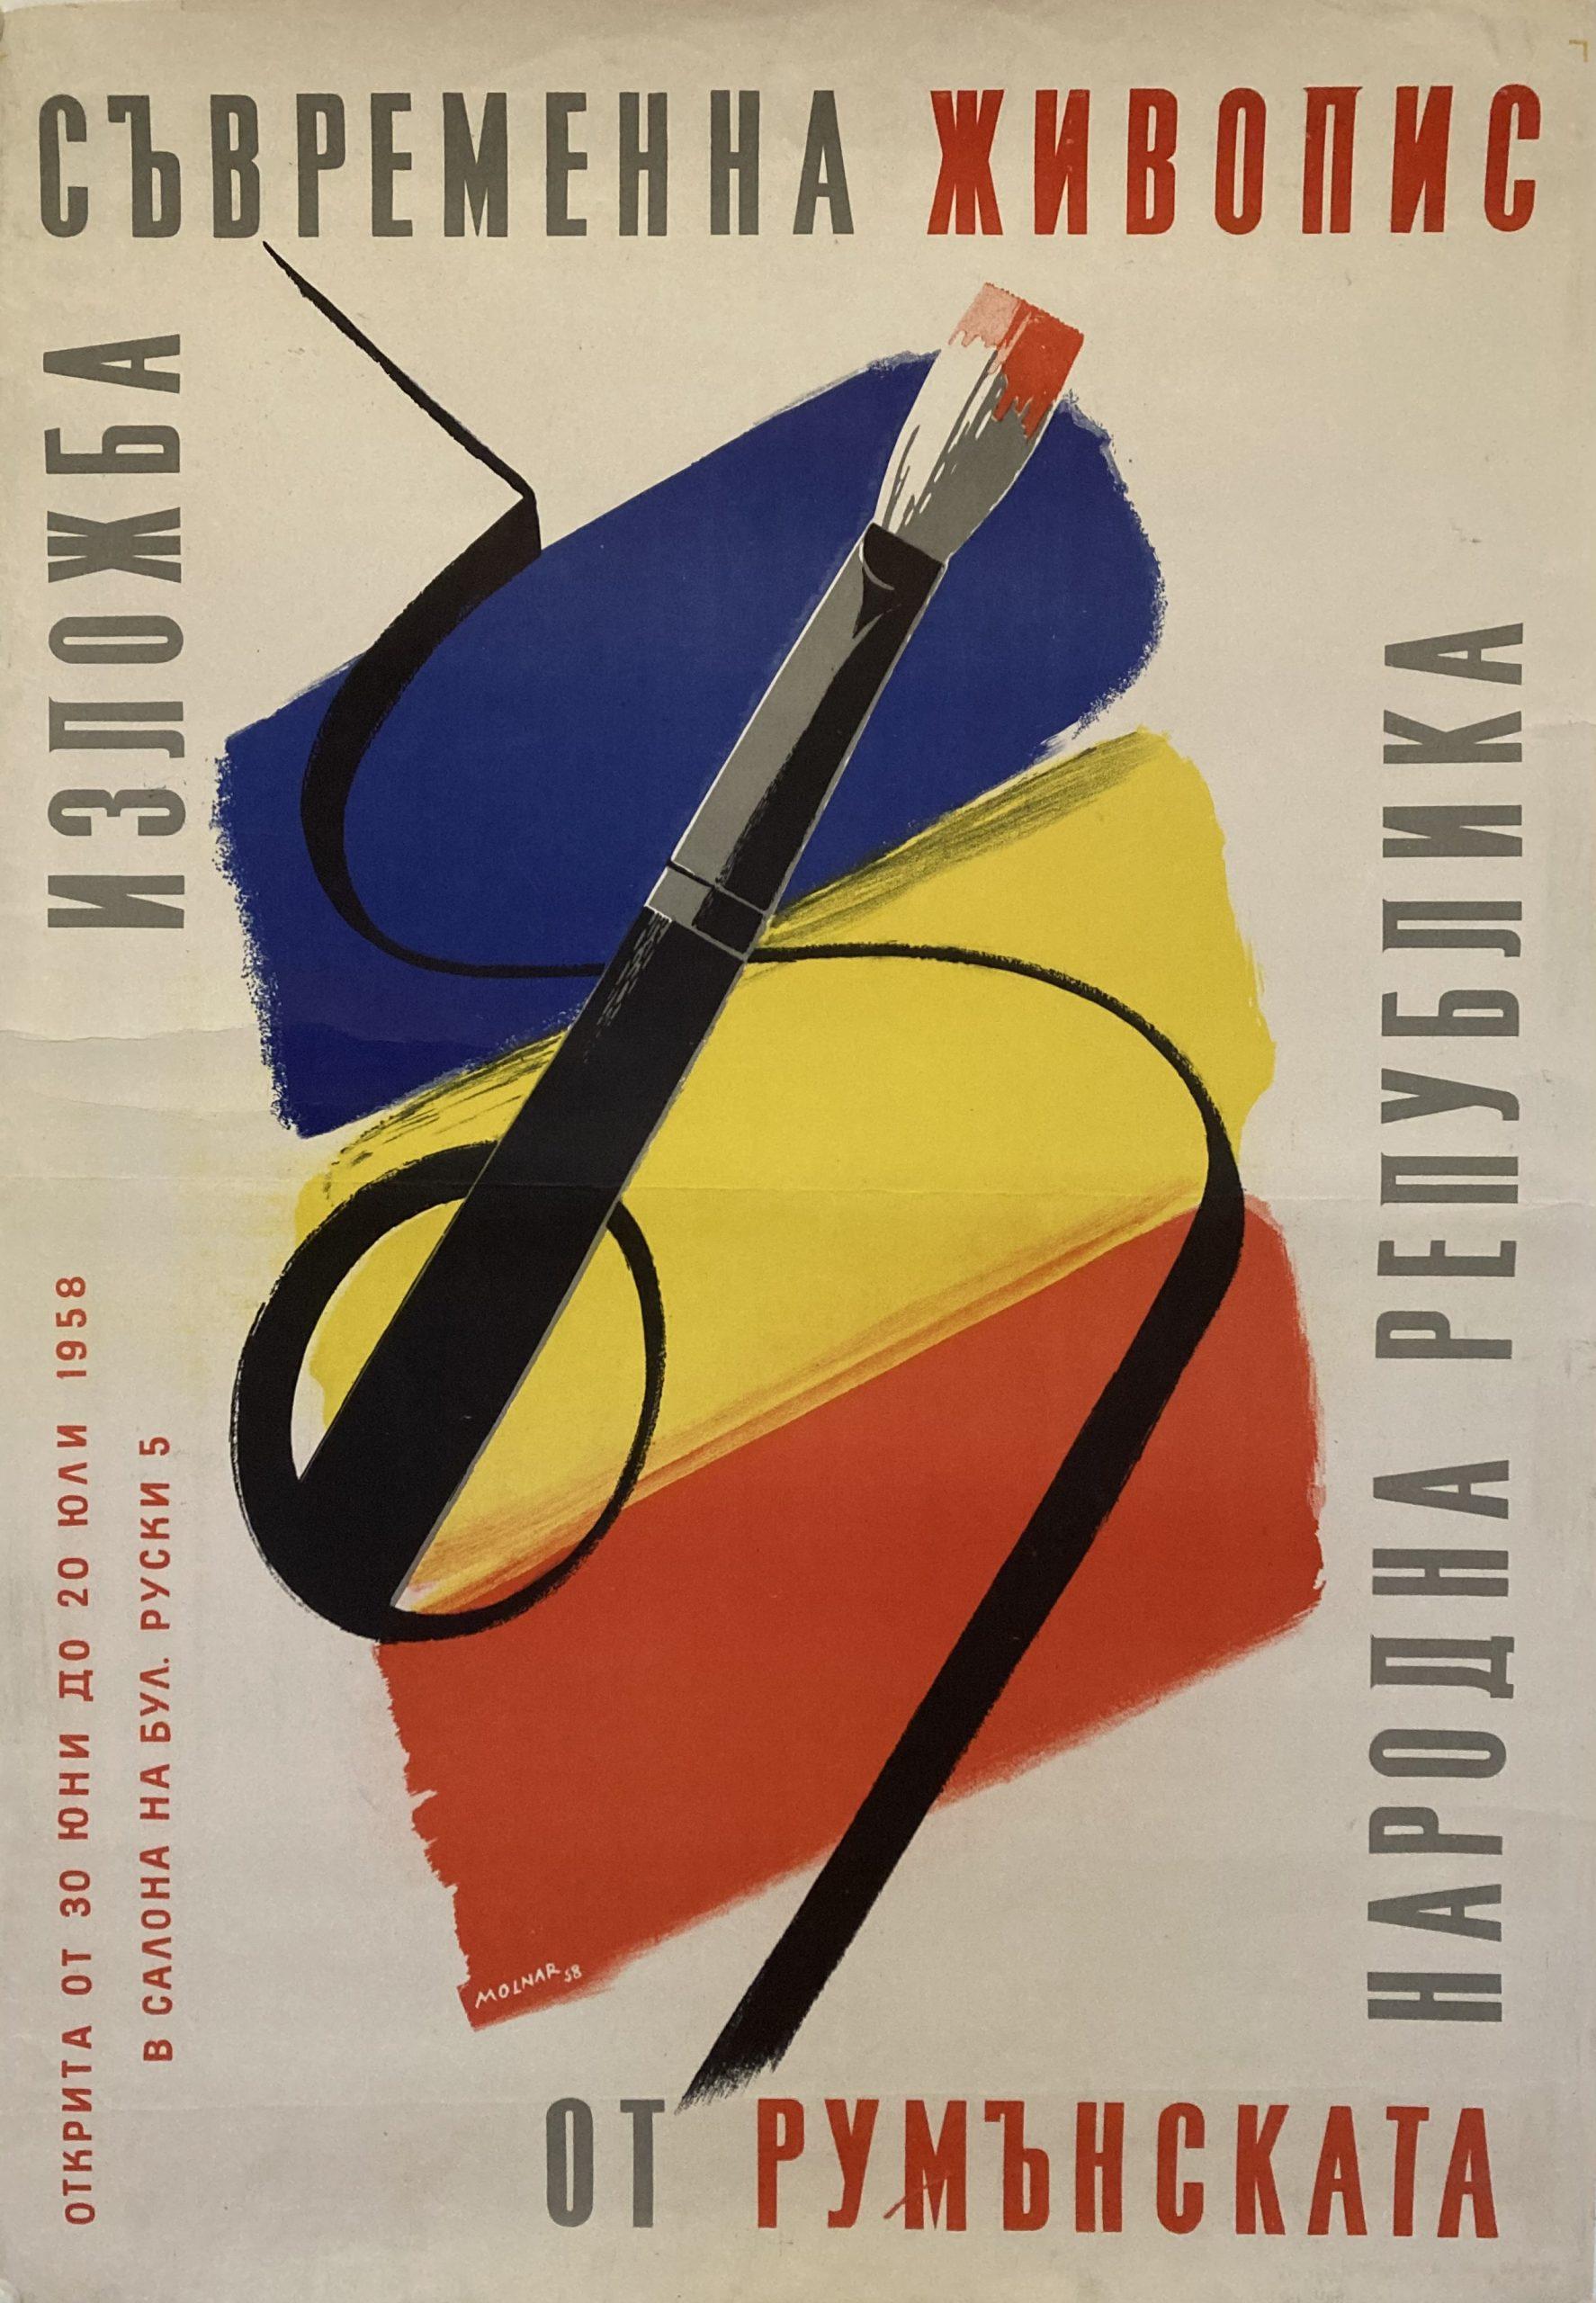 Romanian Art Exhbition in Bulgaria poster